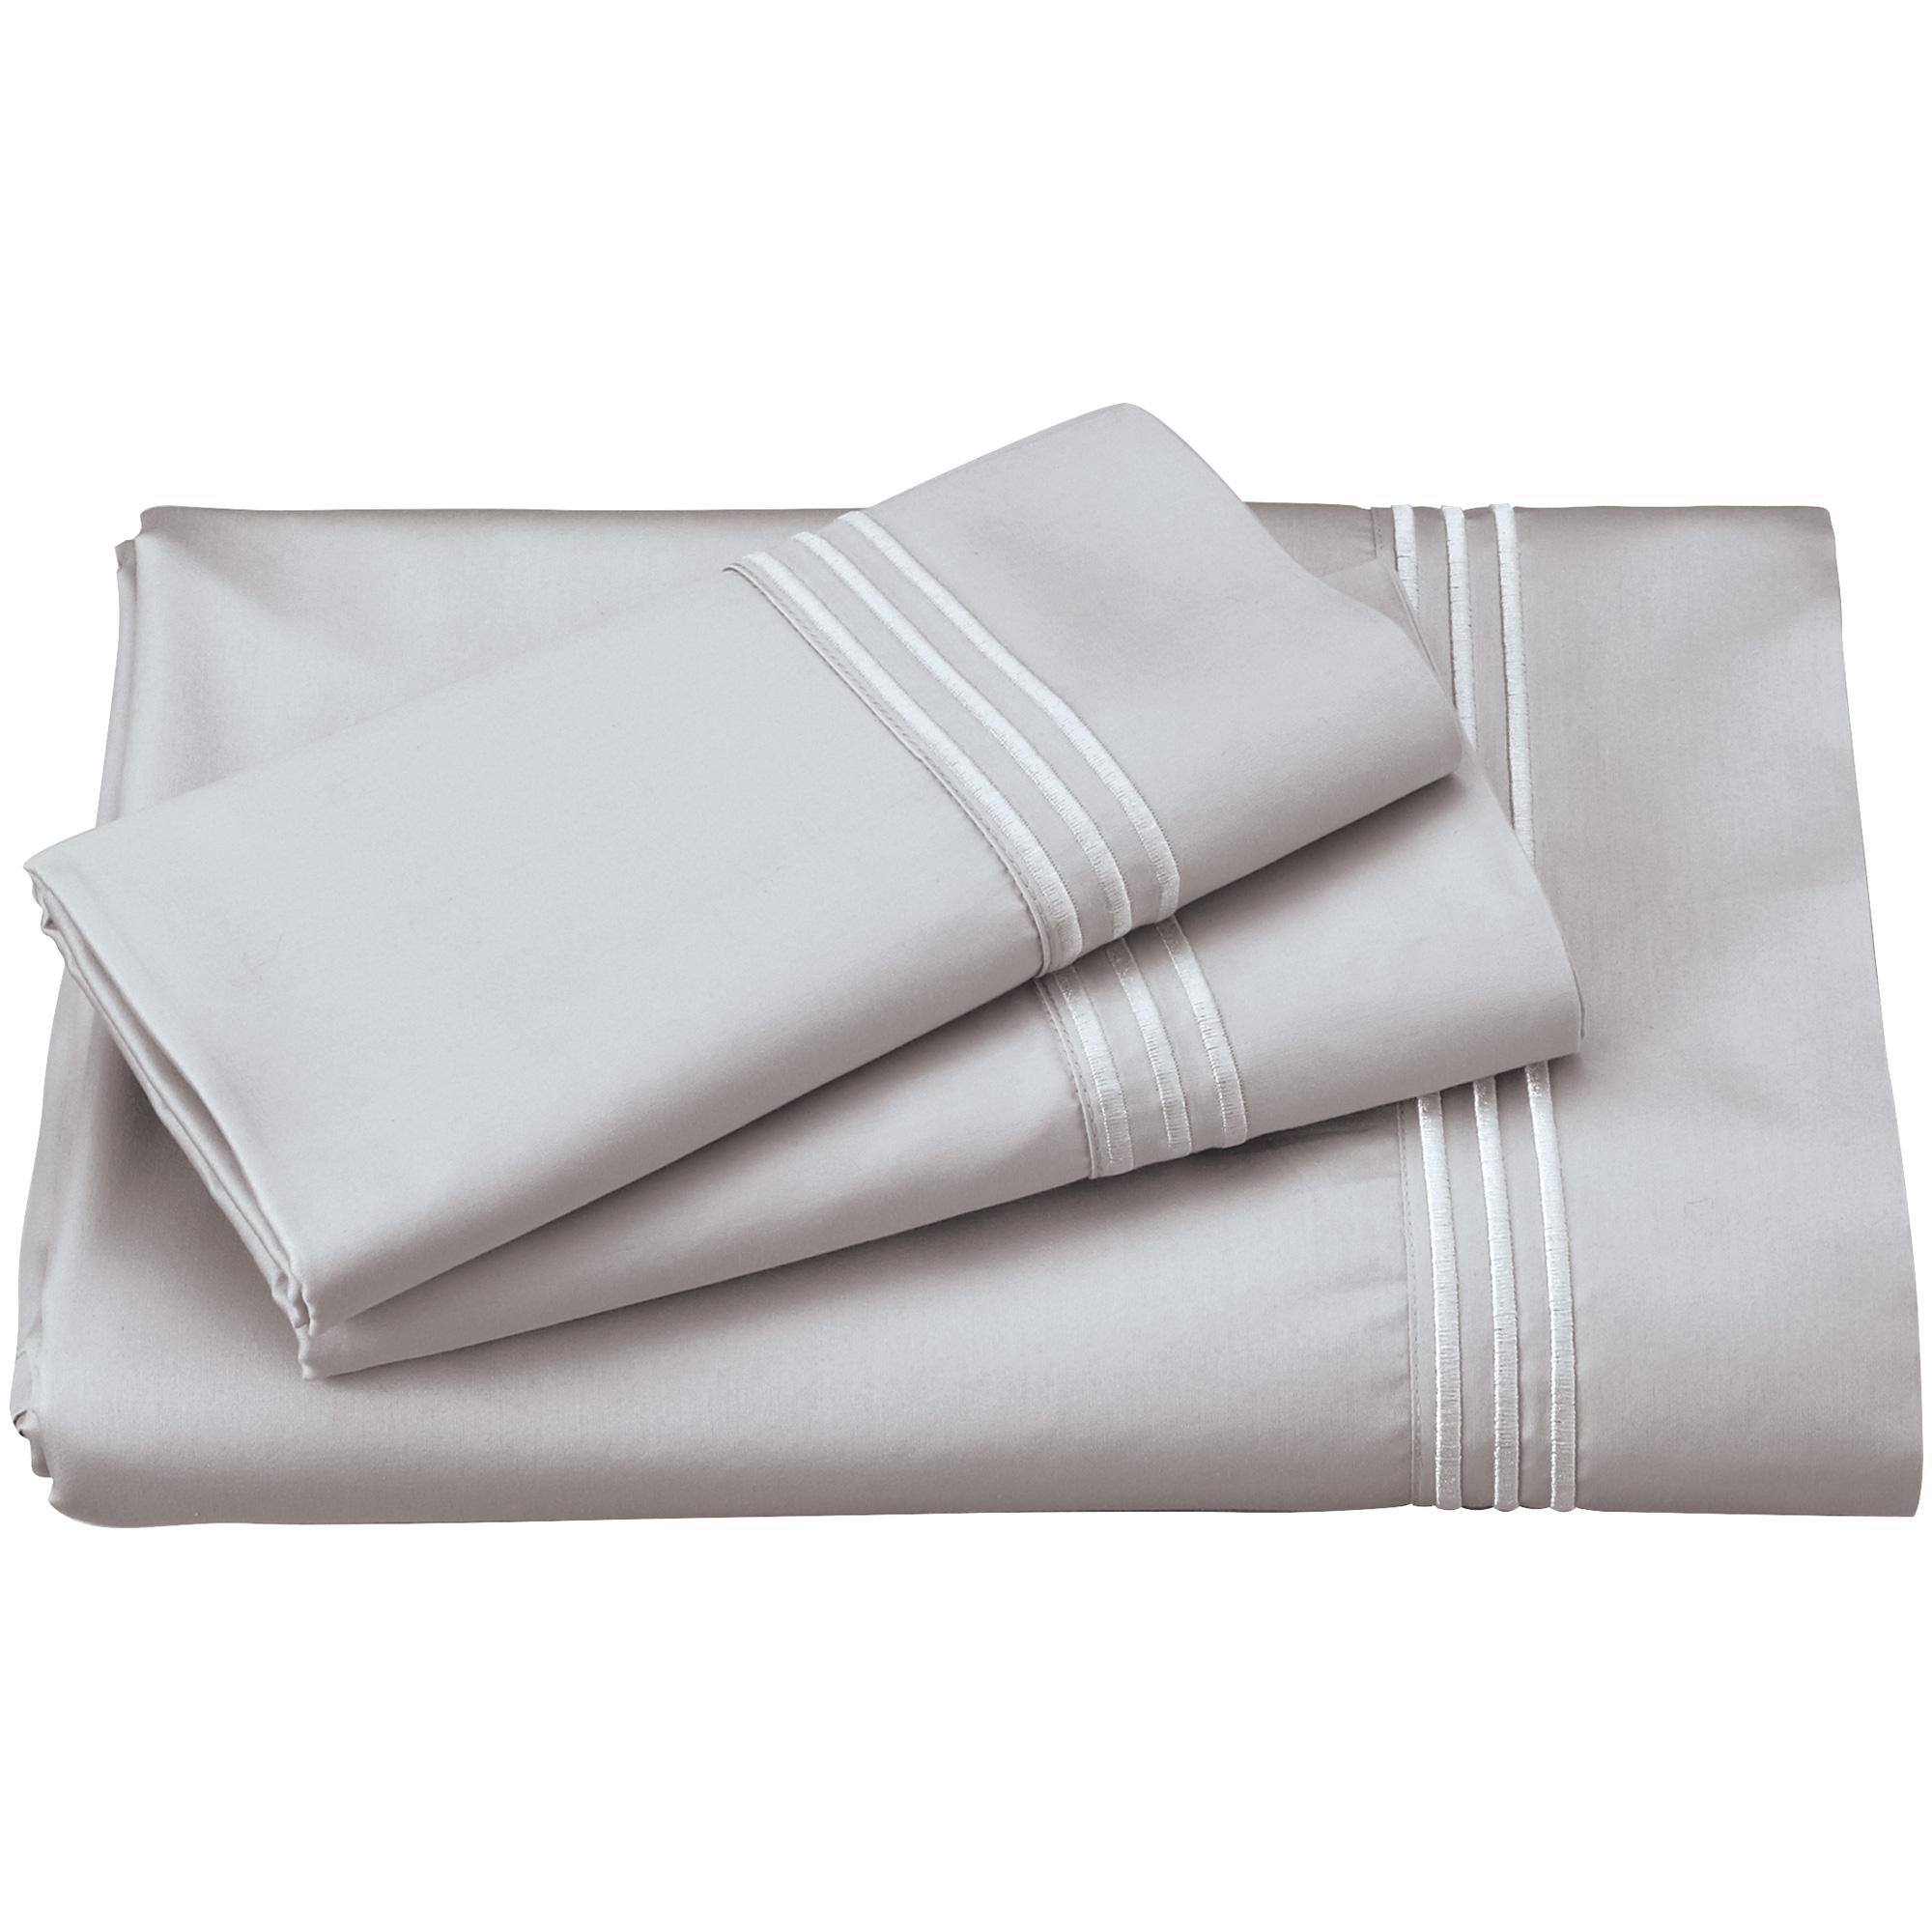 Purecare | Elements Dove Gray Split King Celliant Sheet Set